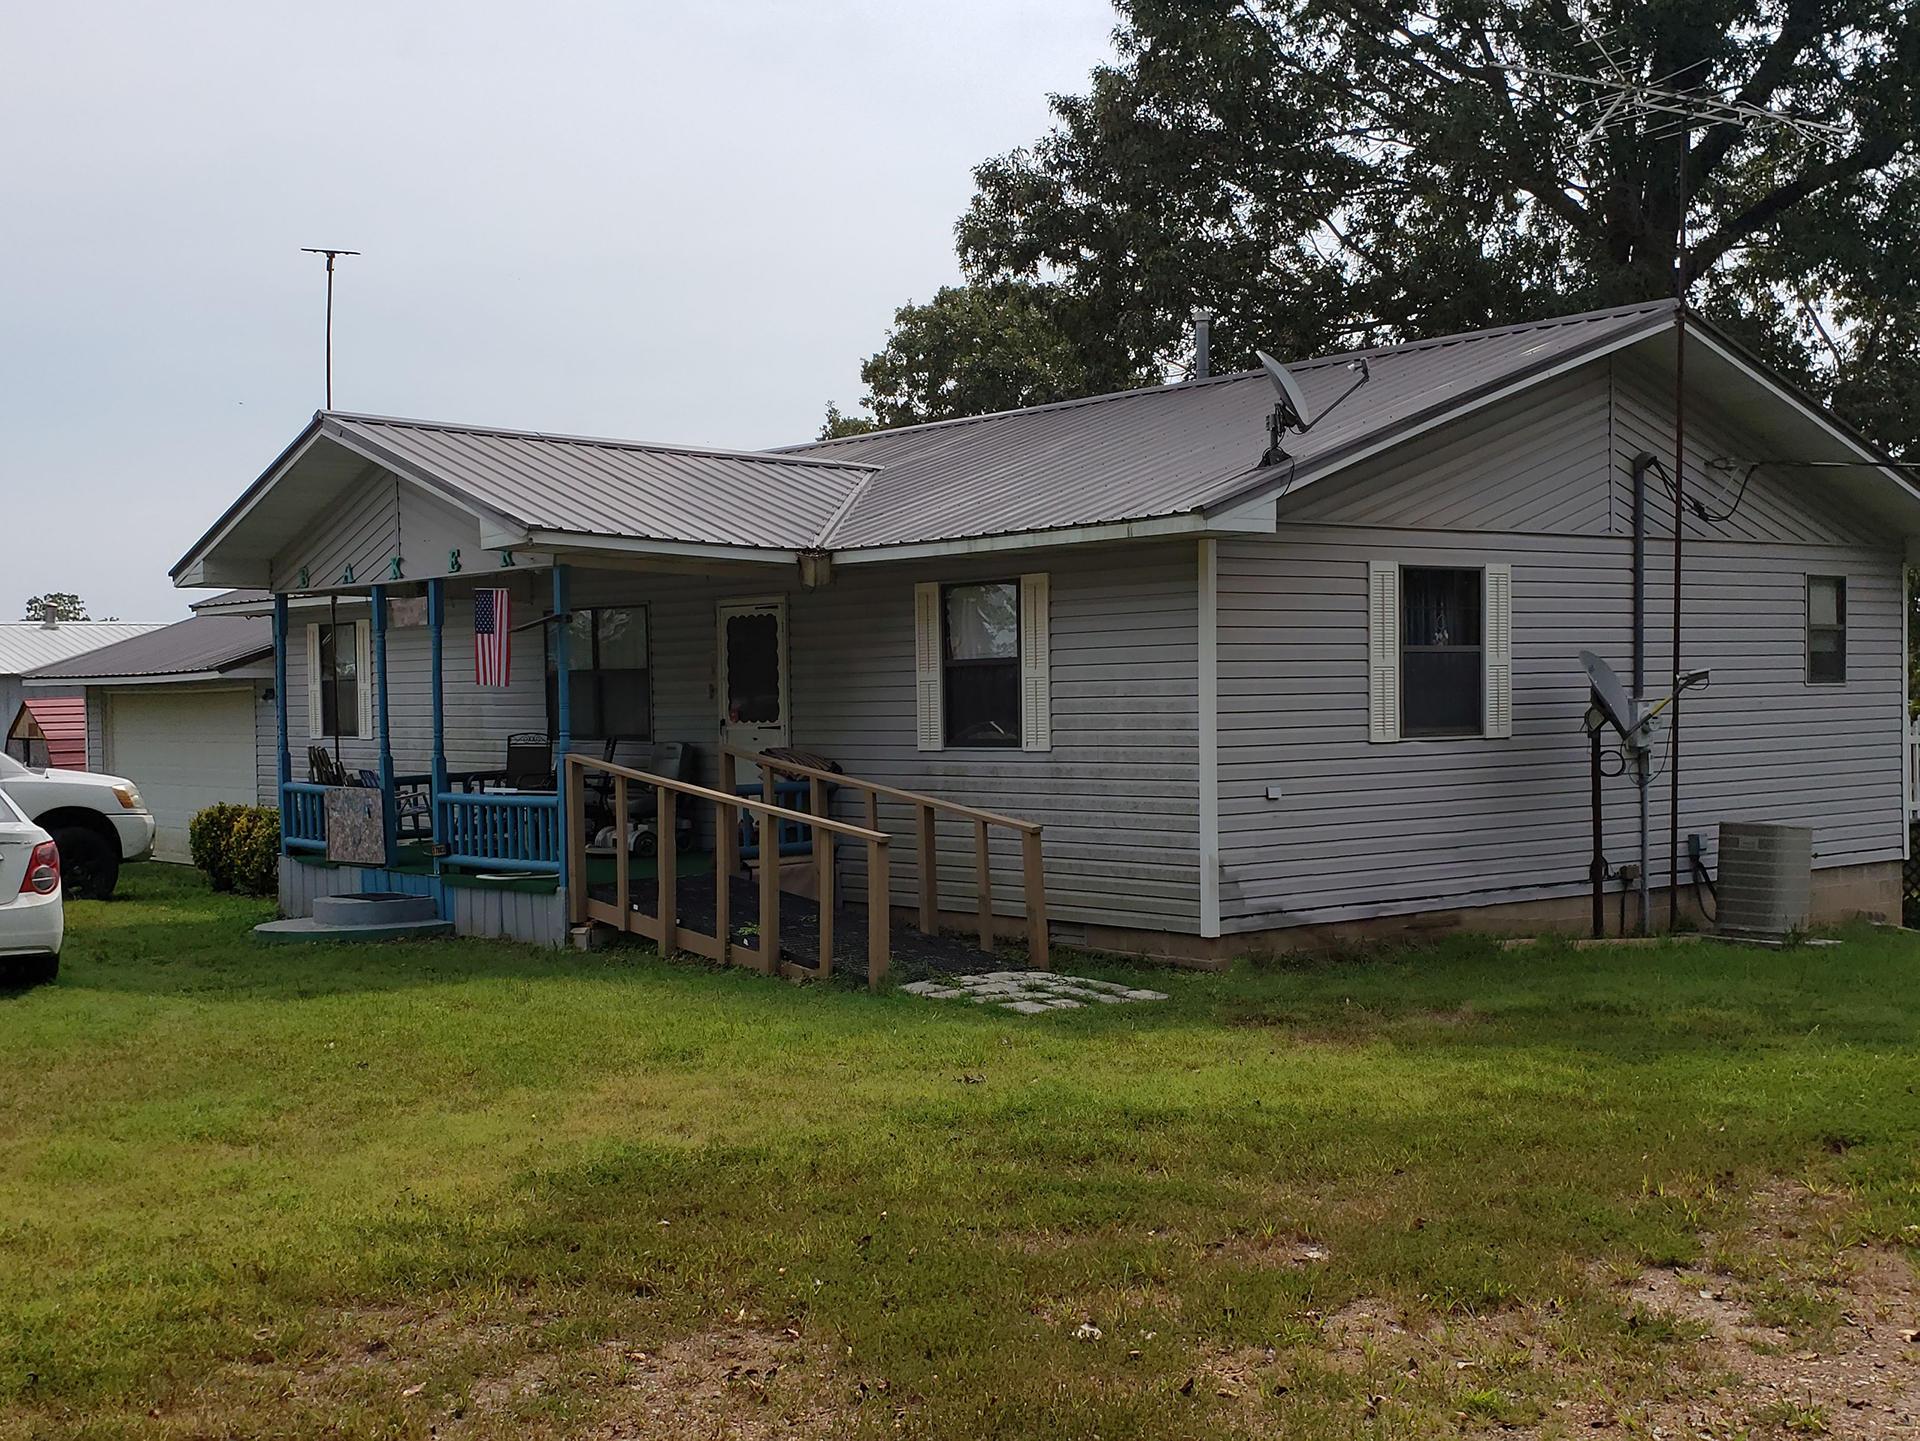 17883 Road Gainesville, MO 65655